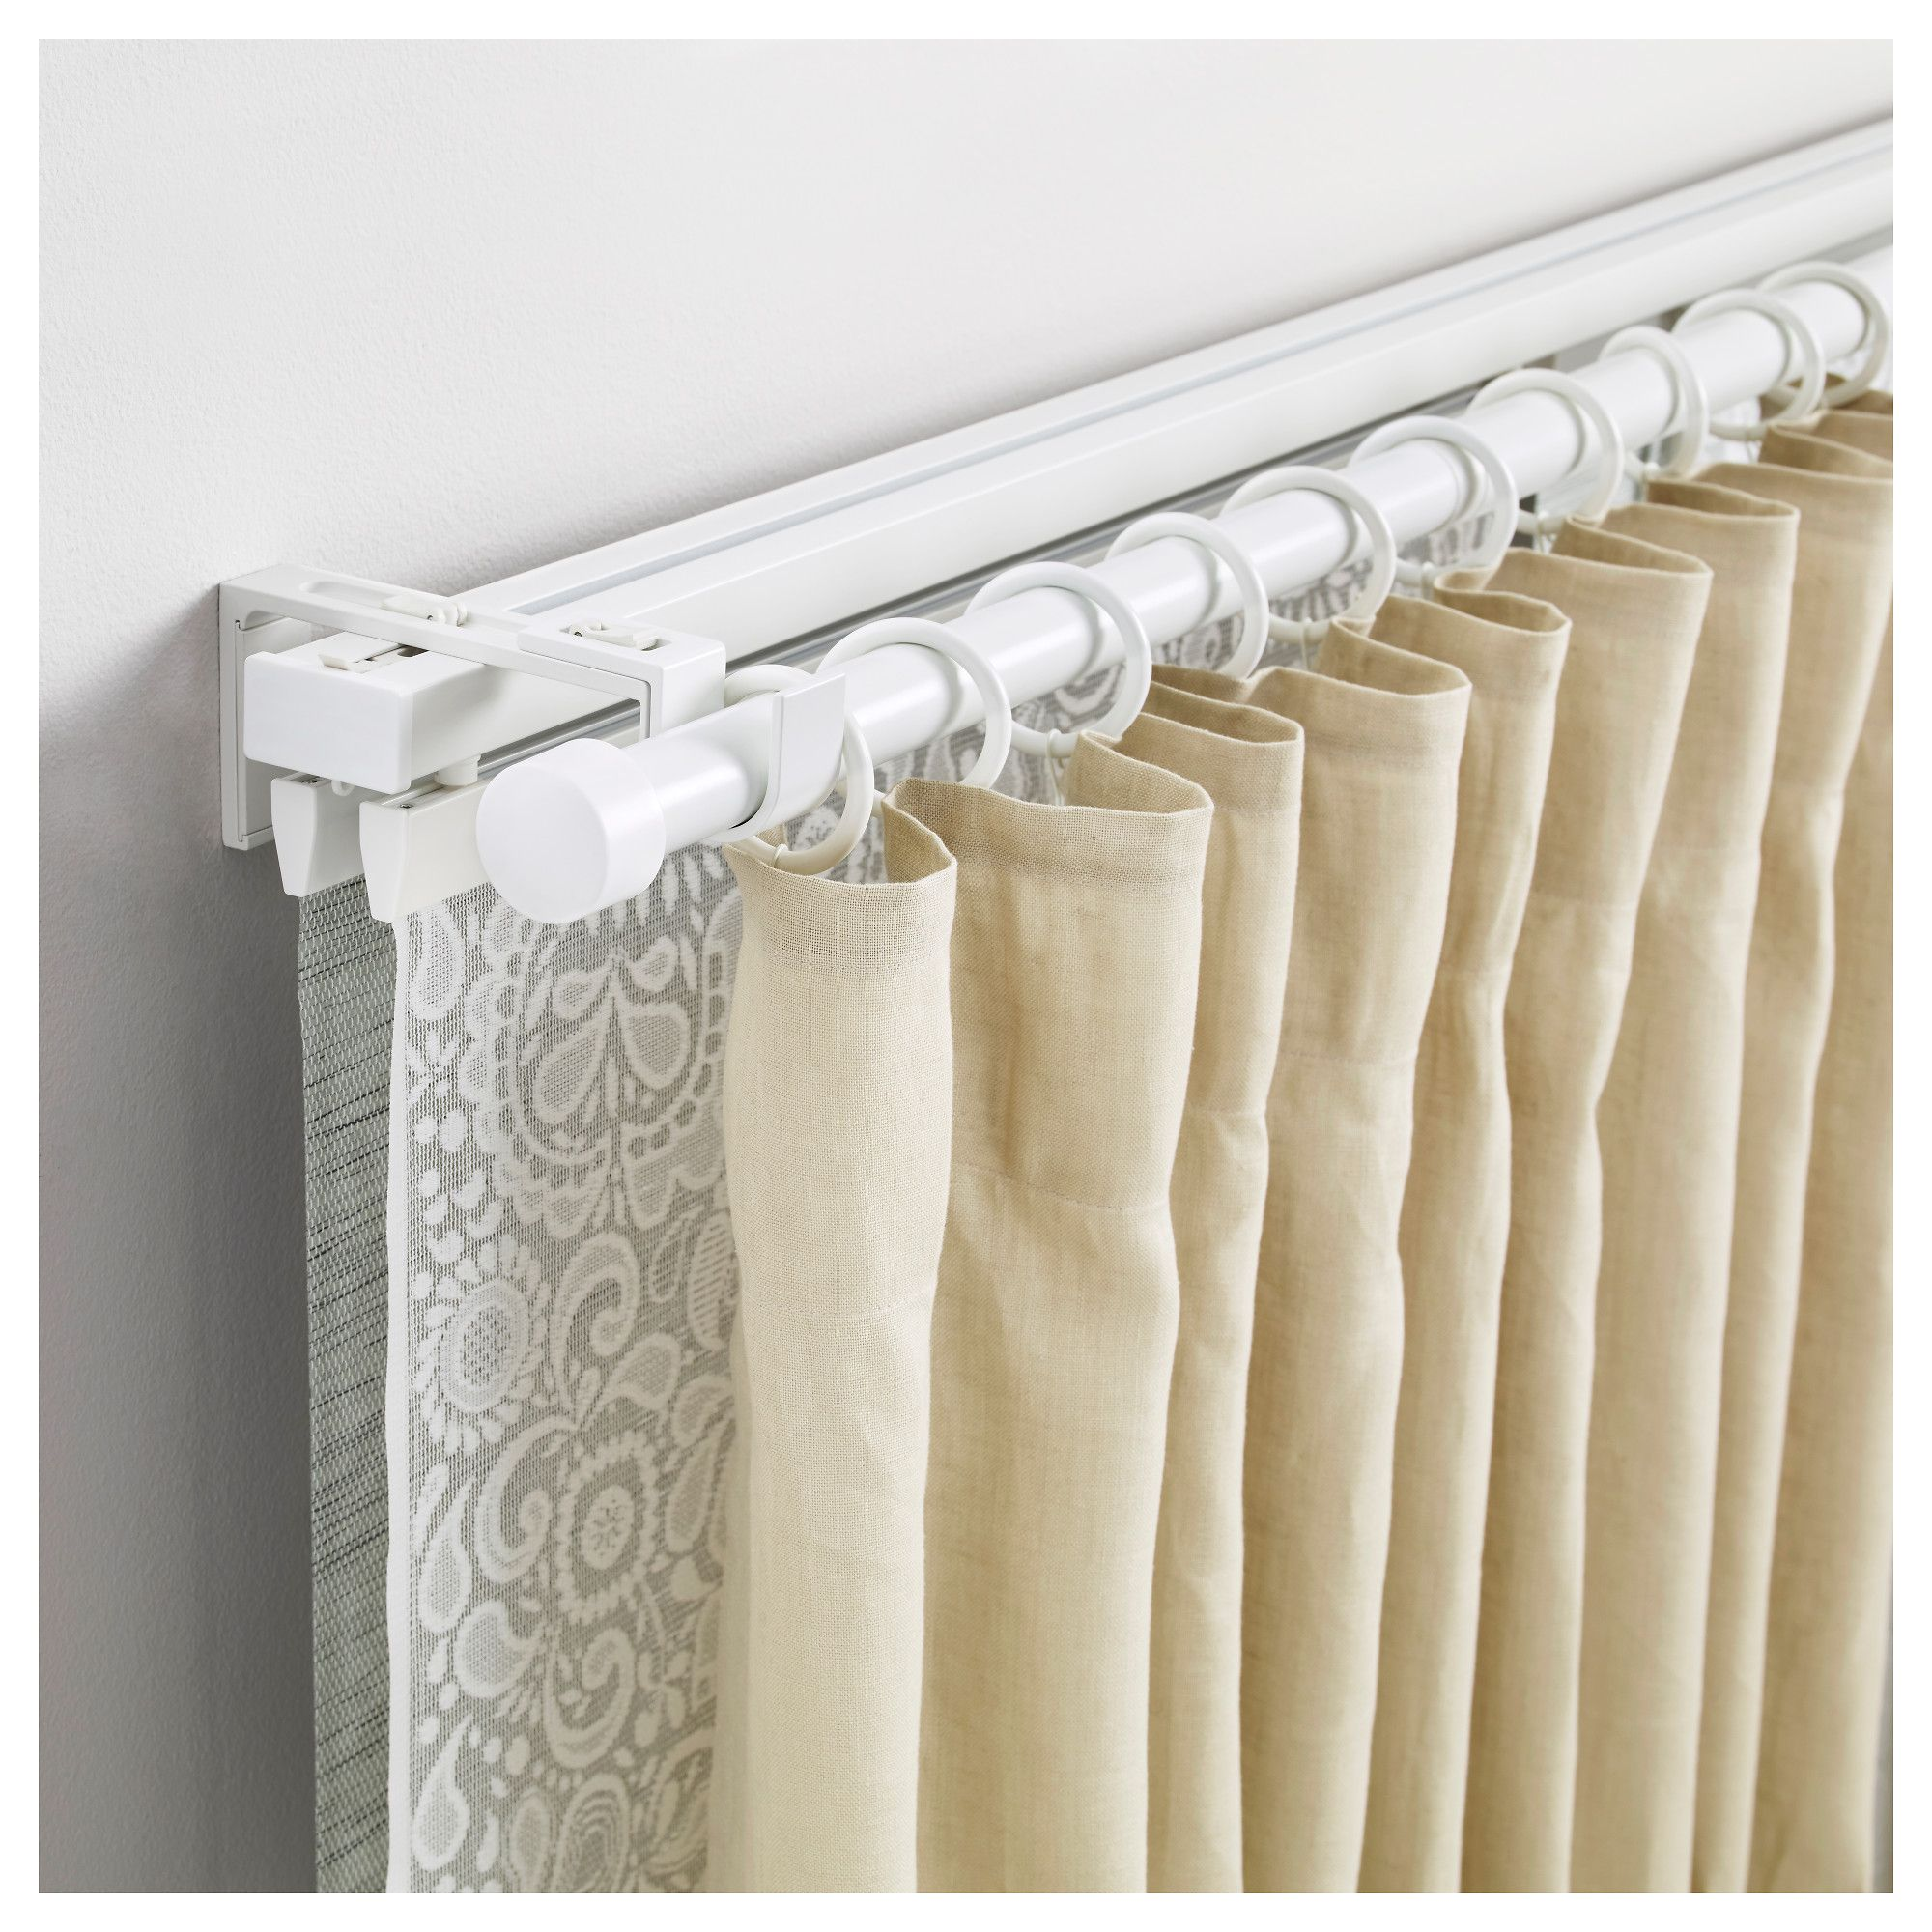 Vidga Triple Track And Rod Set White Curtains Curtain Track